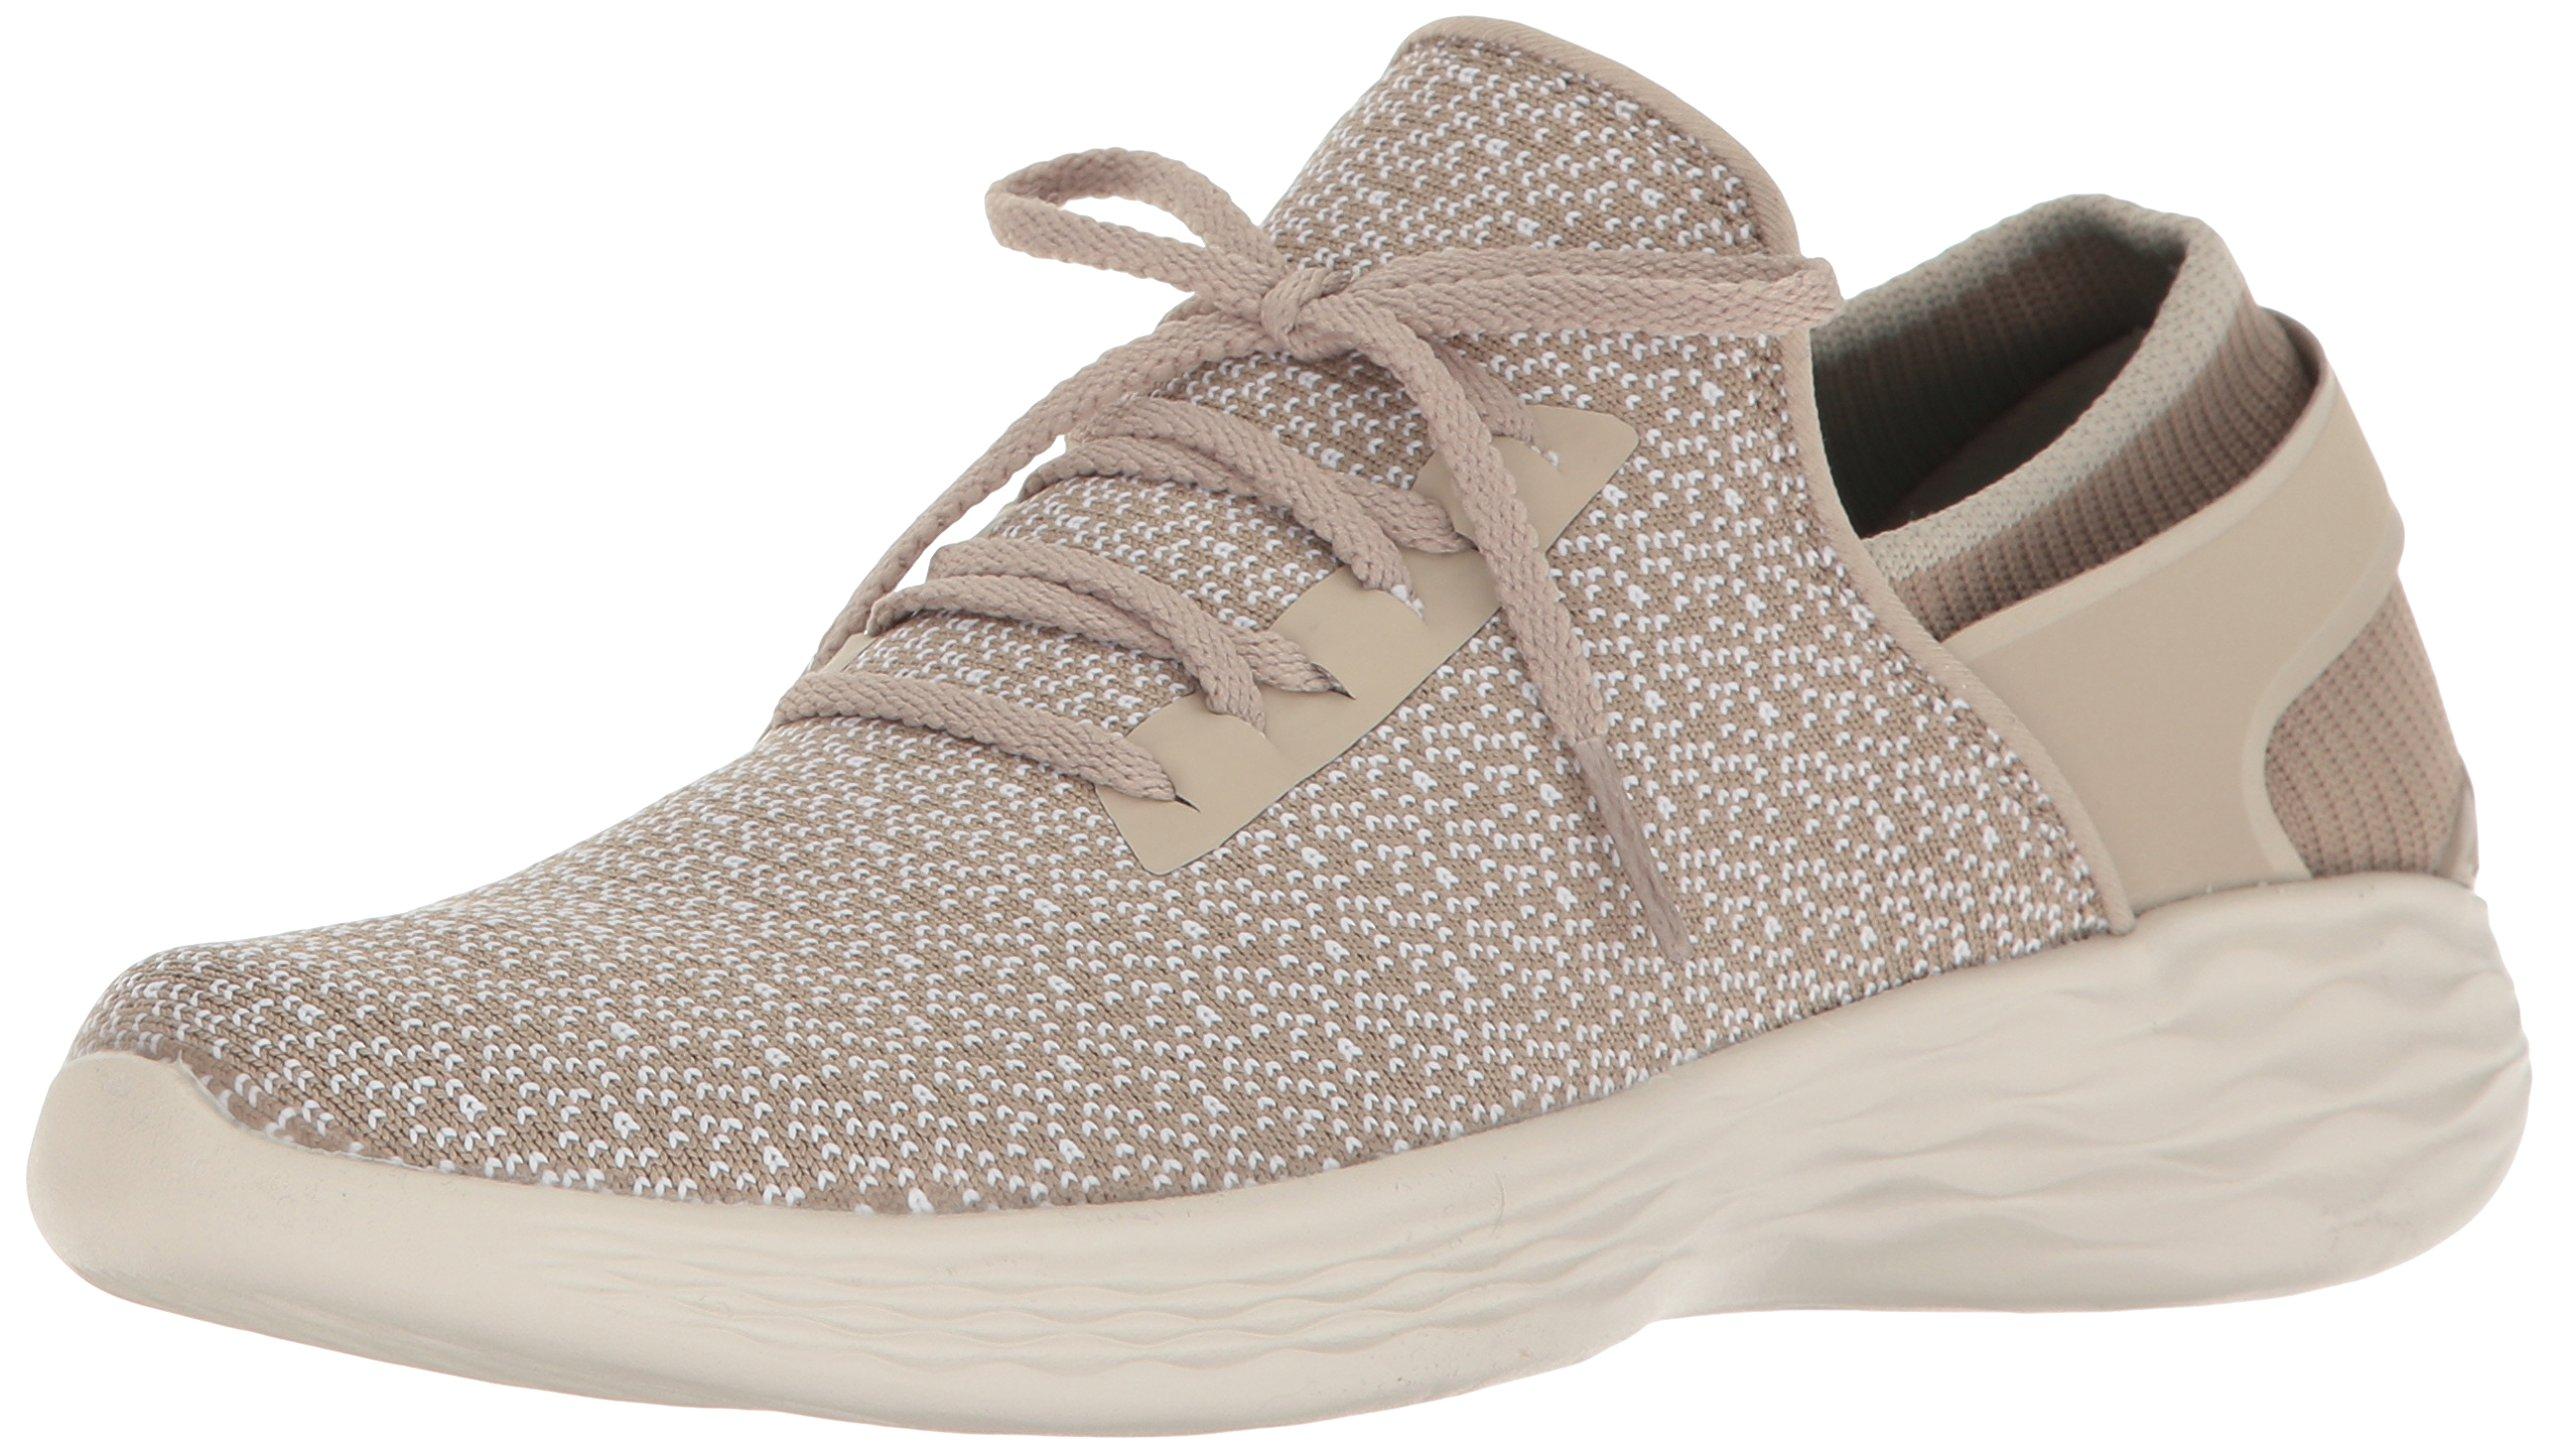 Skechers Women's You Inspire Slip-On Shoe,Natural,9 M US